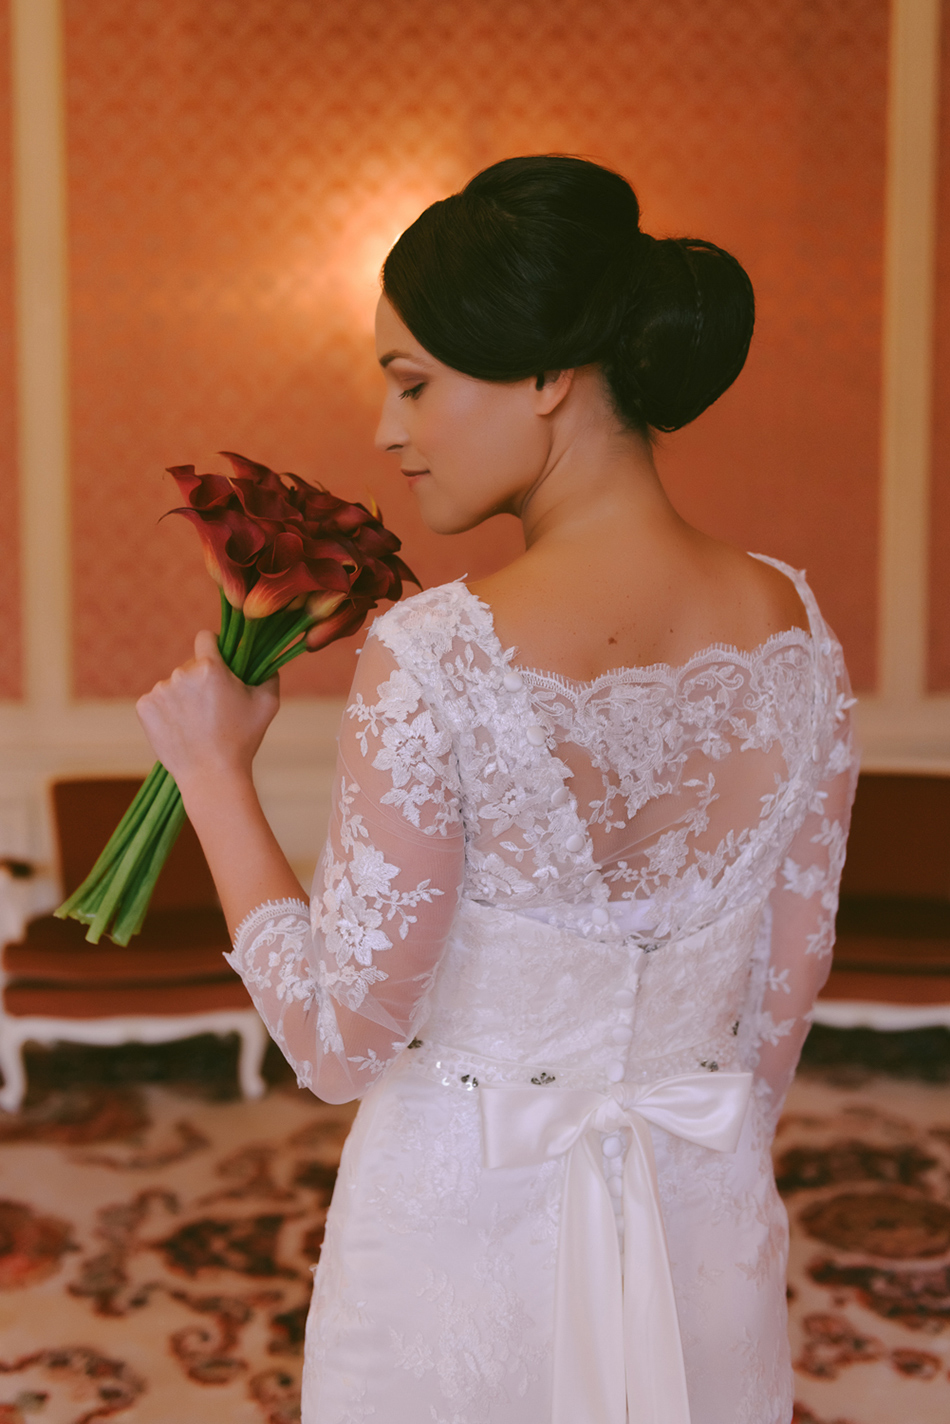 AD Passion Photography | fotograf-nunta-sinaia-flo-oana_0043 | Adelin, Dida, fotograf profesionist, fotograf de nunta, fotografie de nunta, fotograf Timisoara, fotograf Craiova, fotograf Bucuresti, fotograf Arad, nunta Timisoara, nunta Arad, nunta Bucuresti, nunta Craiova